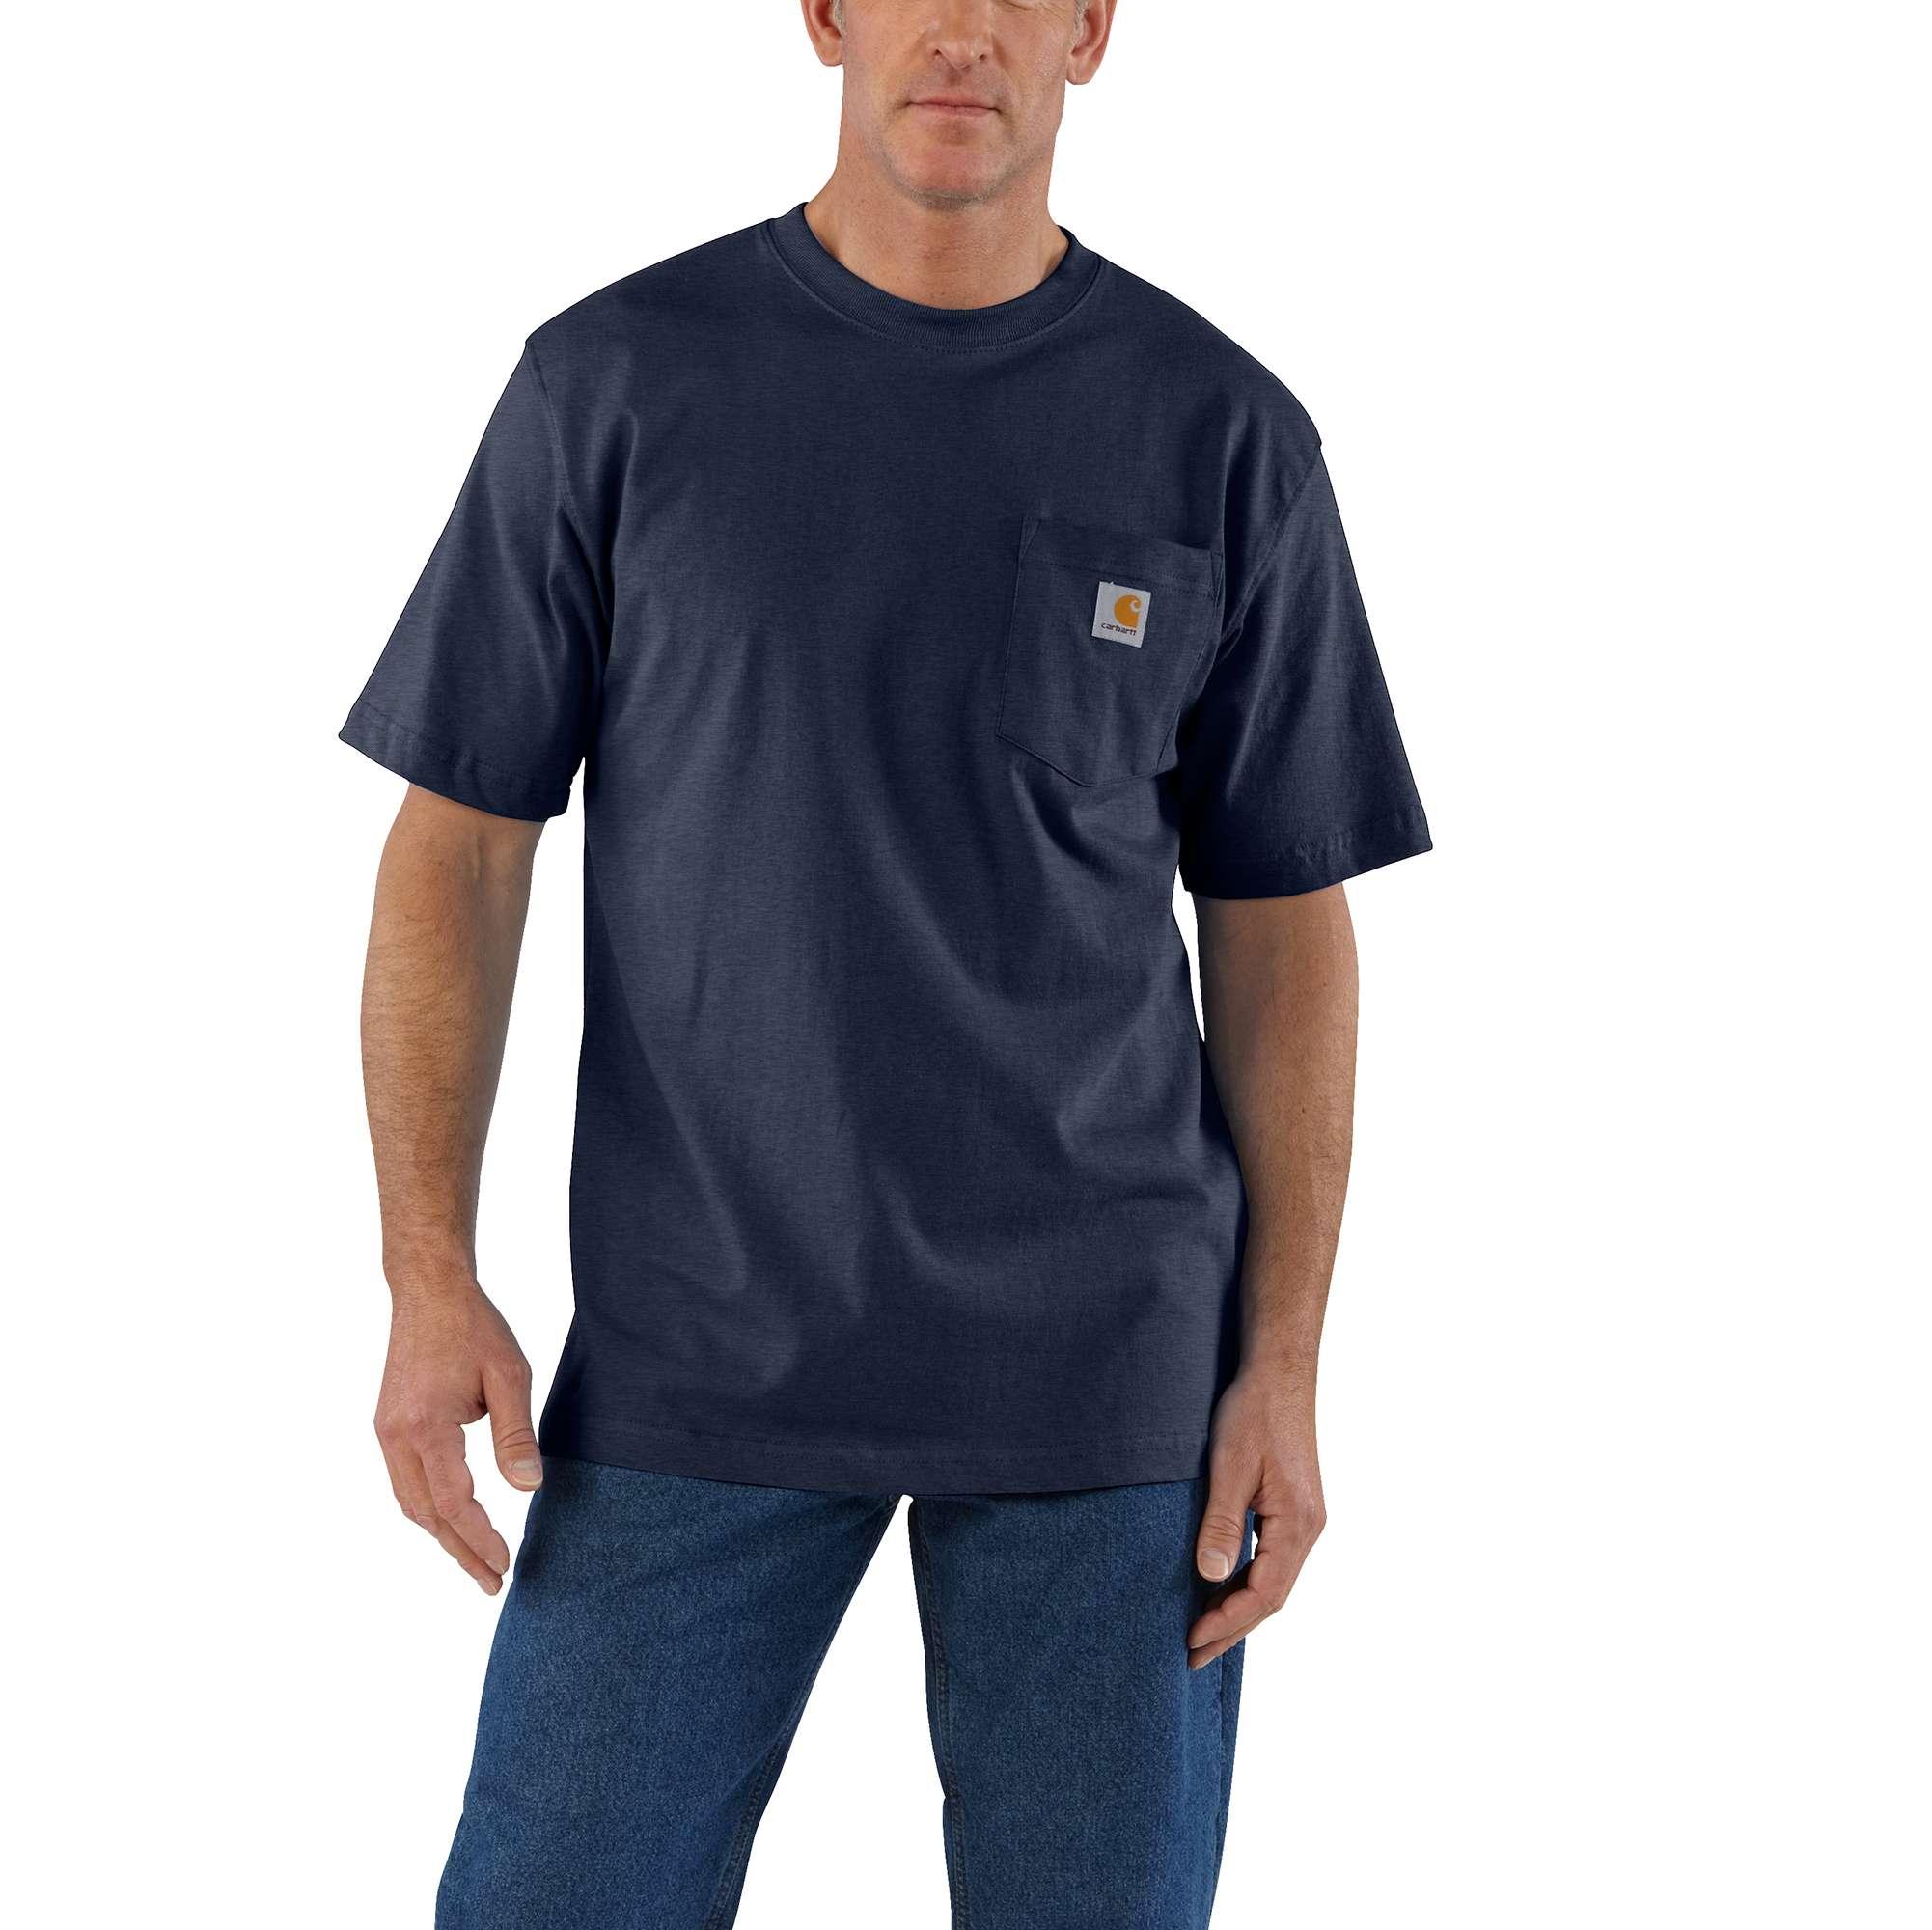 Men's Workwear Pocket Tee, Gray/Navy, swatch